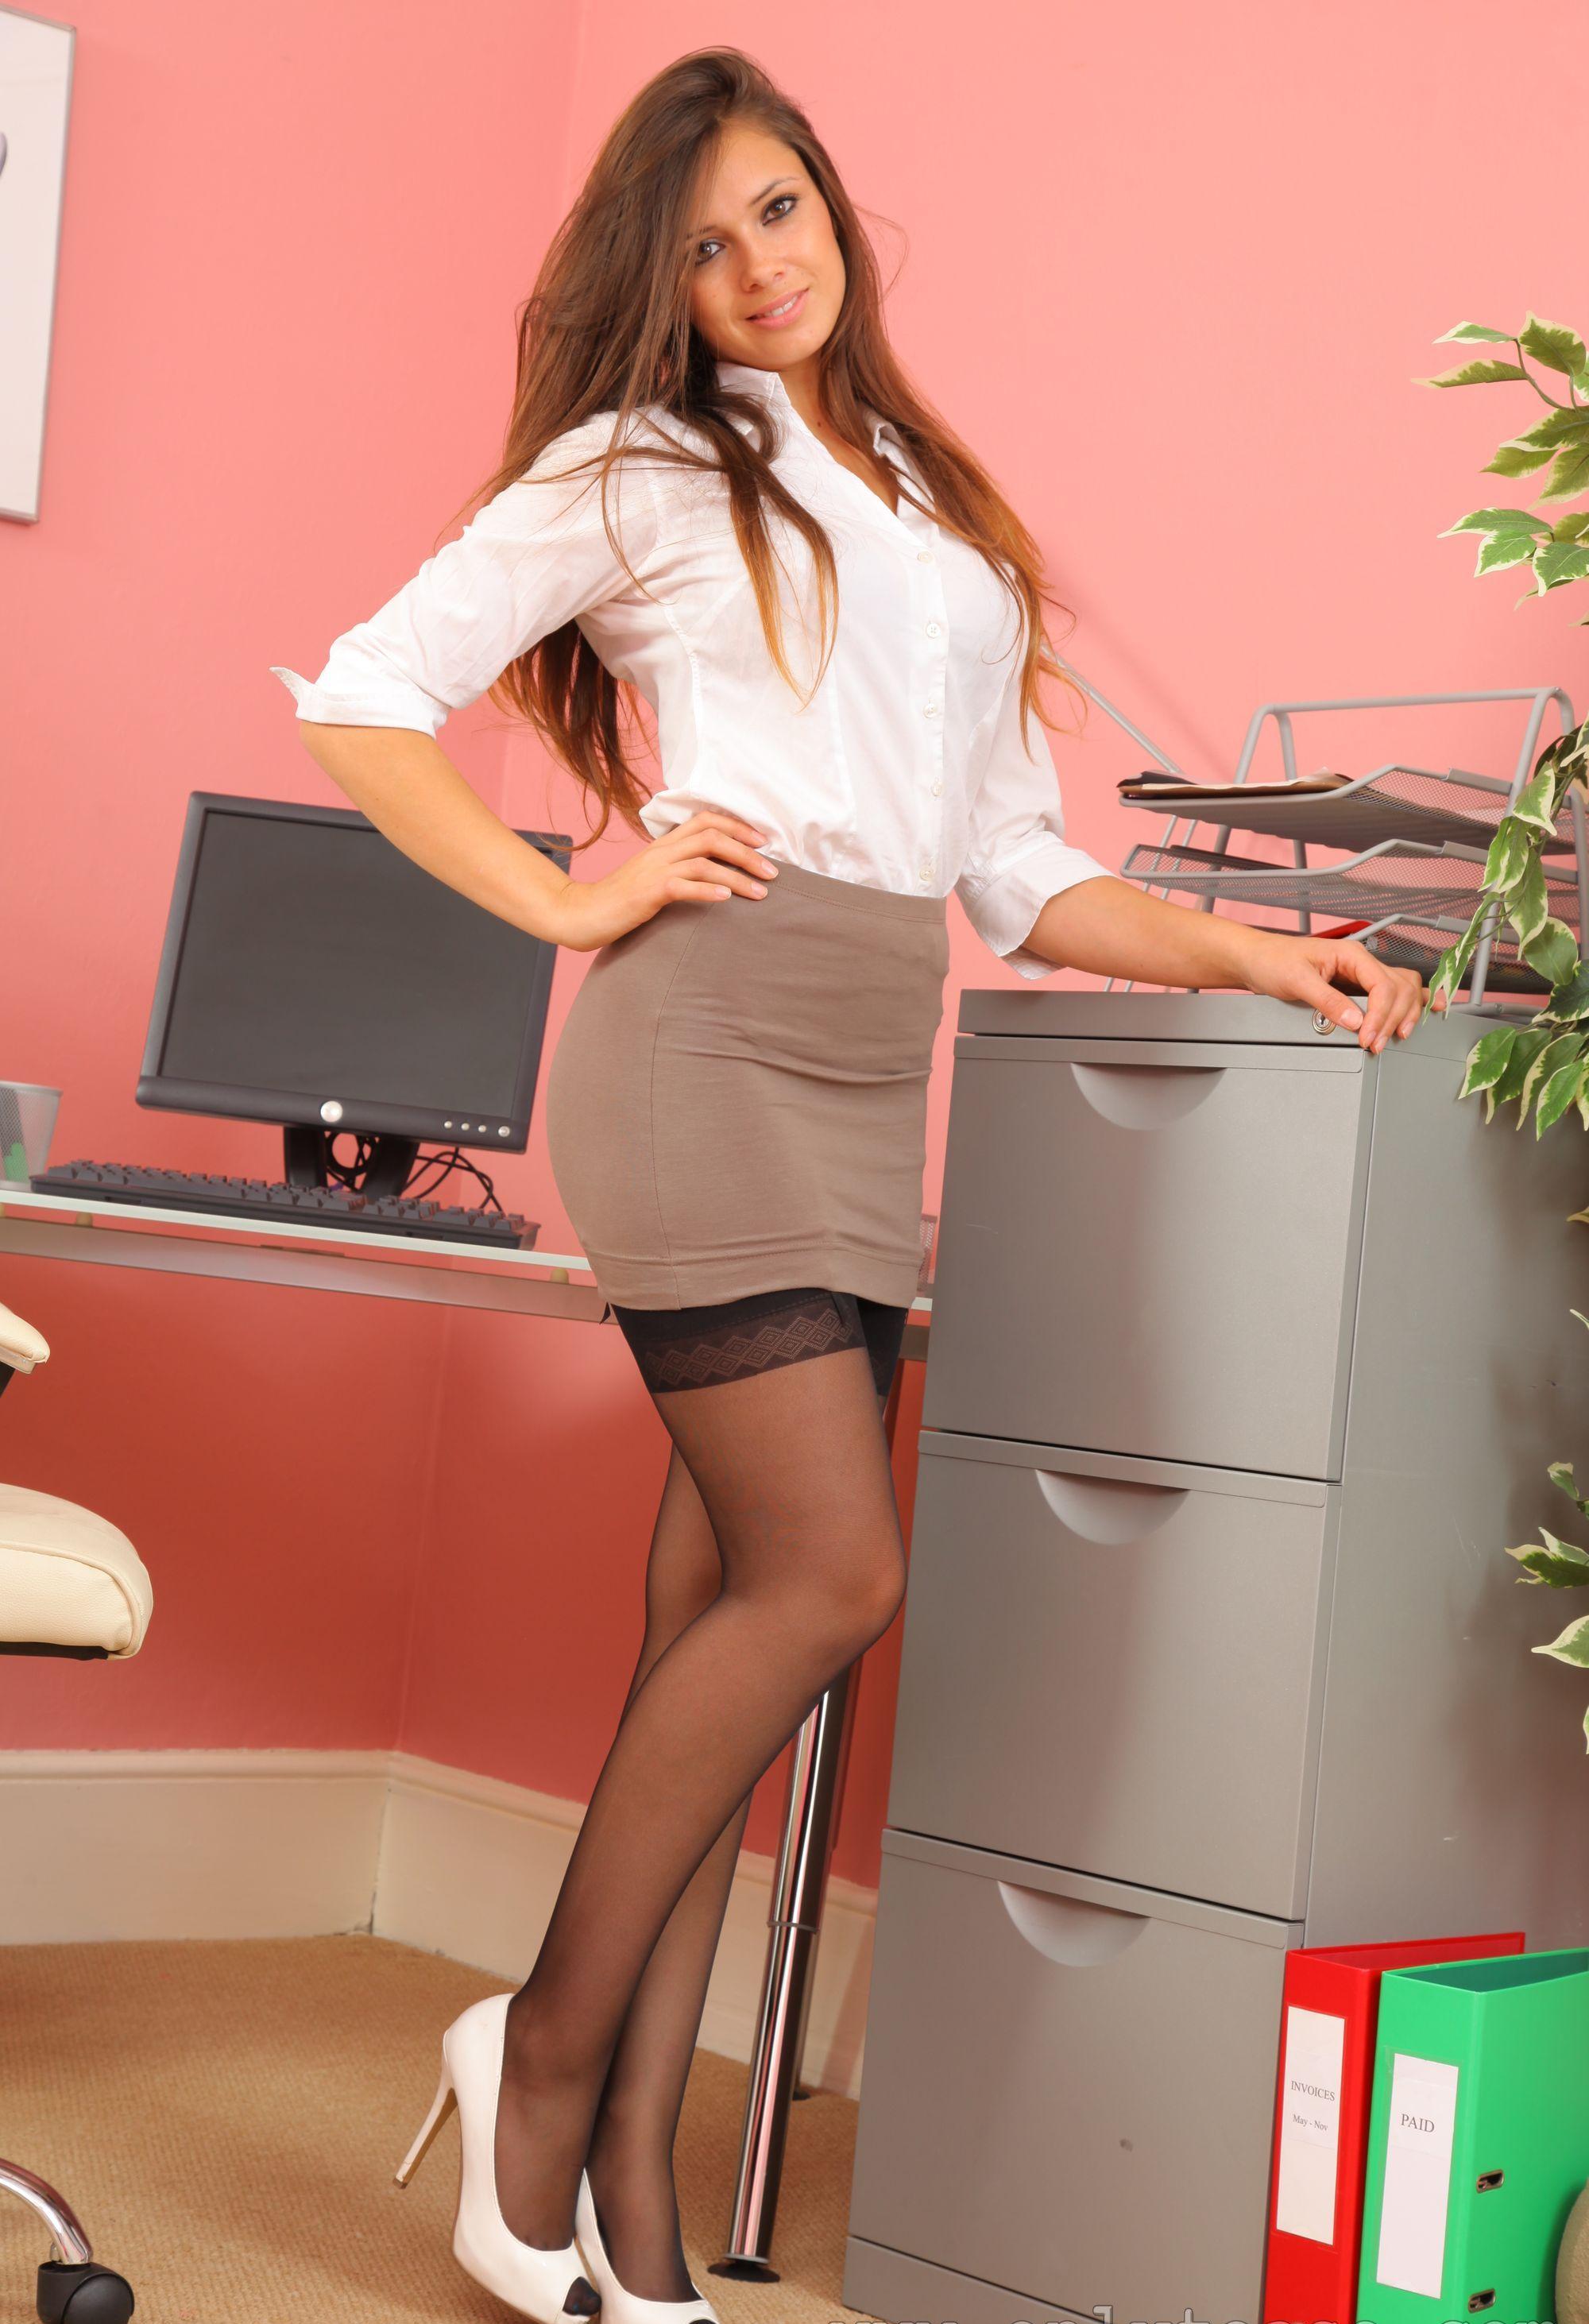 curvy maid Secretary blonde